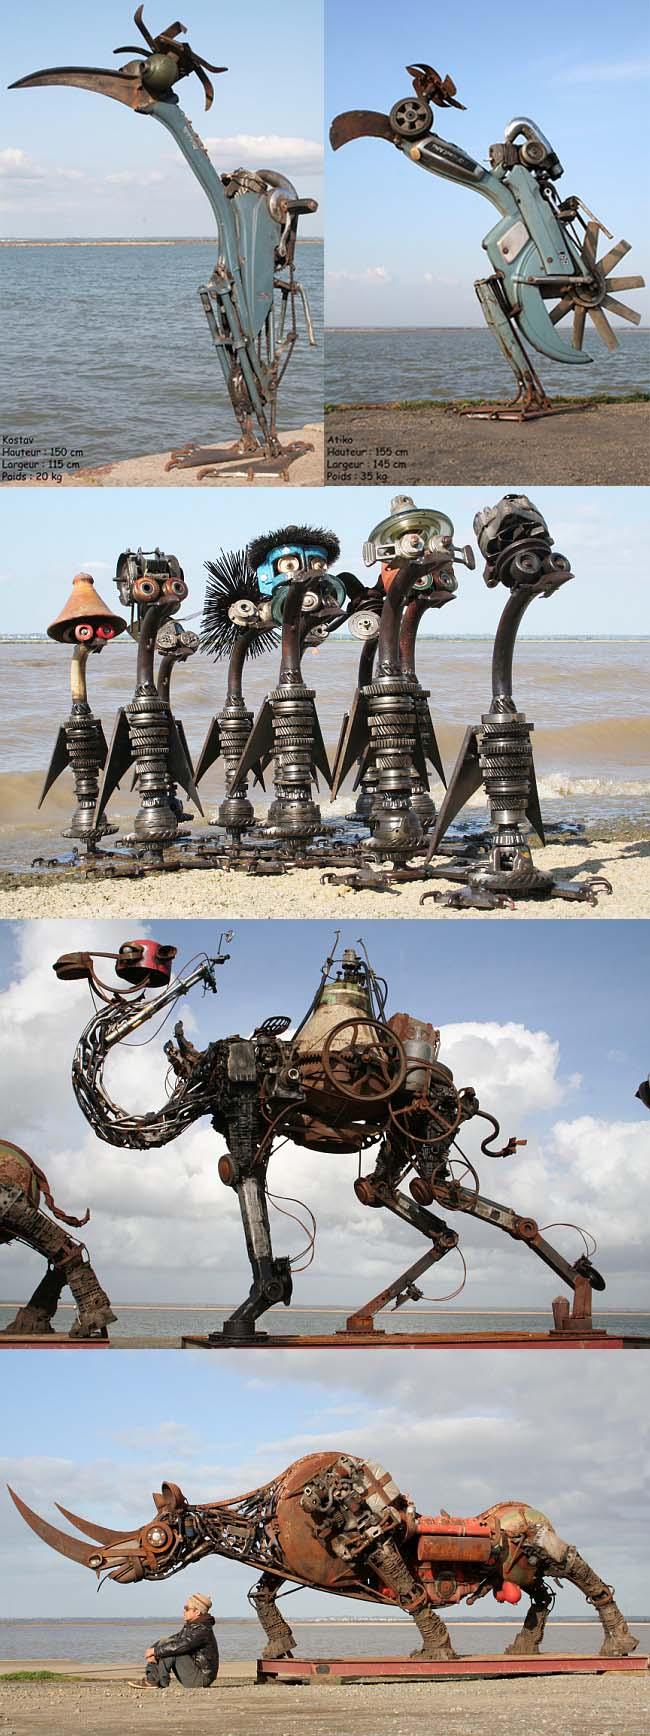 Art contemporain artistique Christian_champin_sculptures